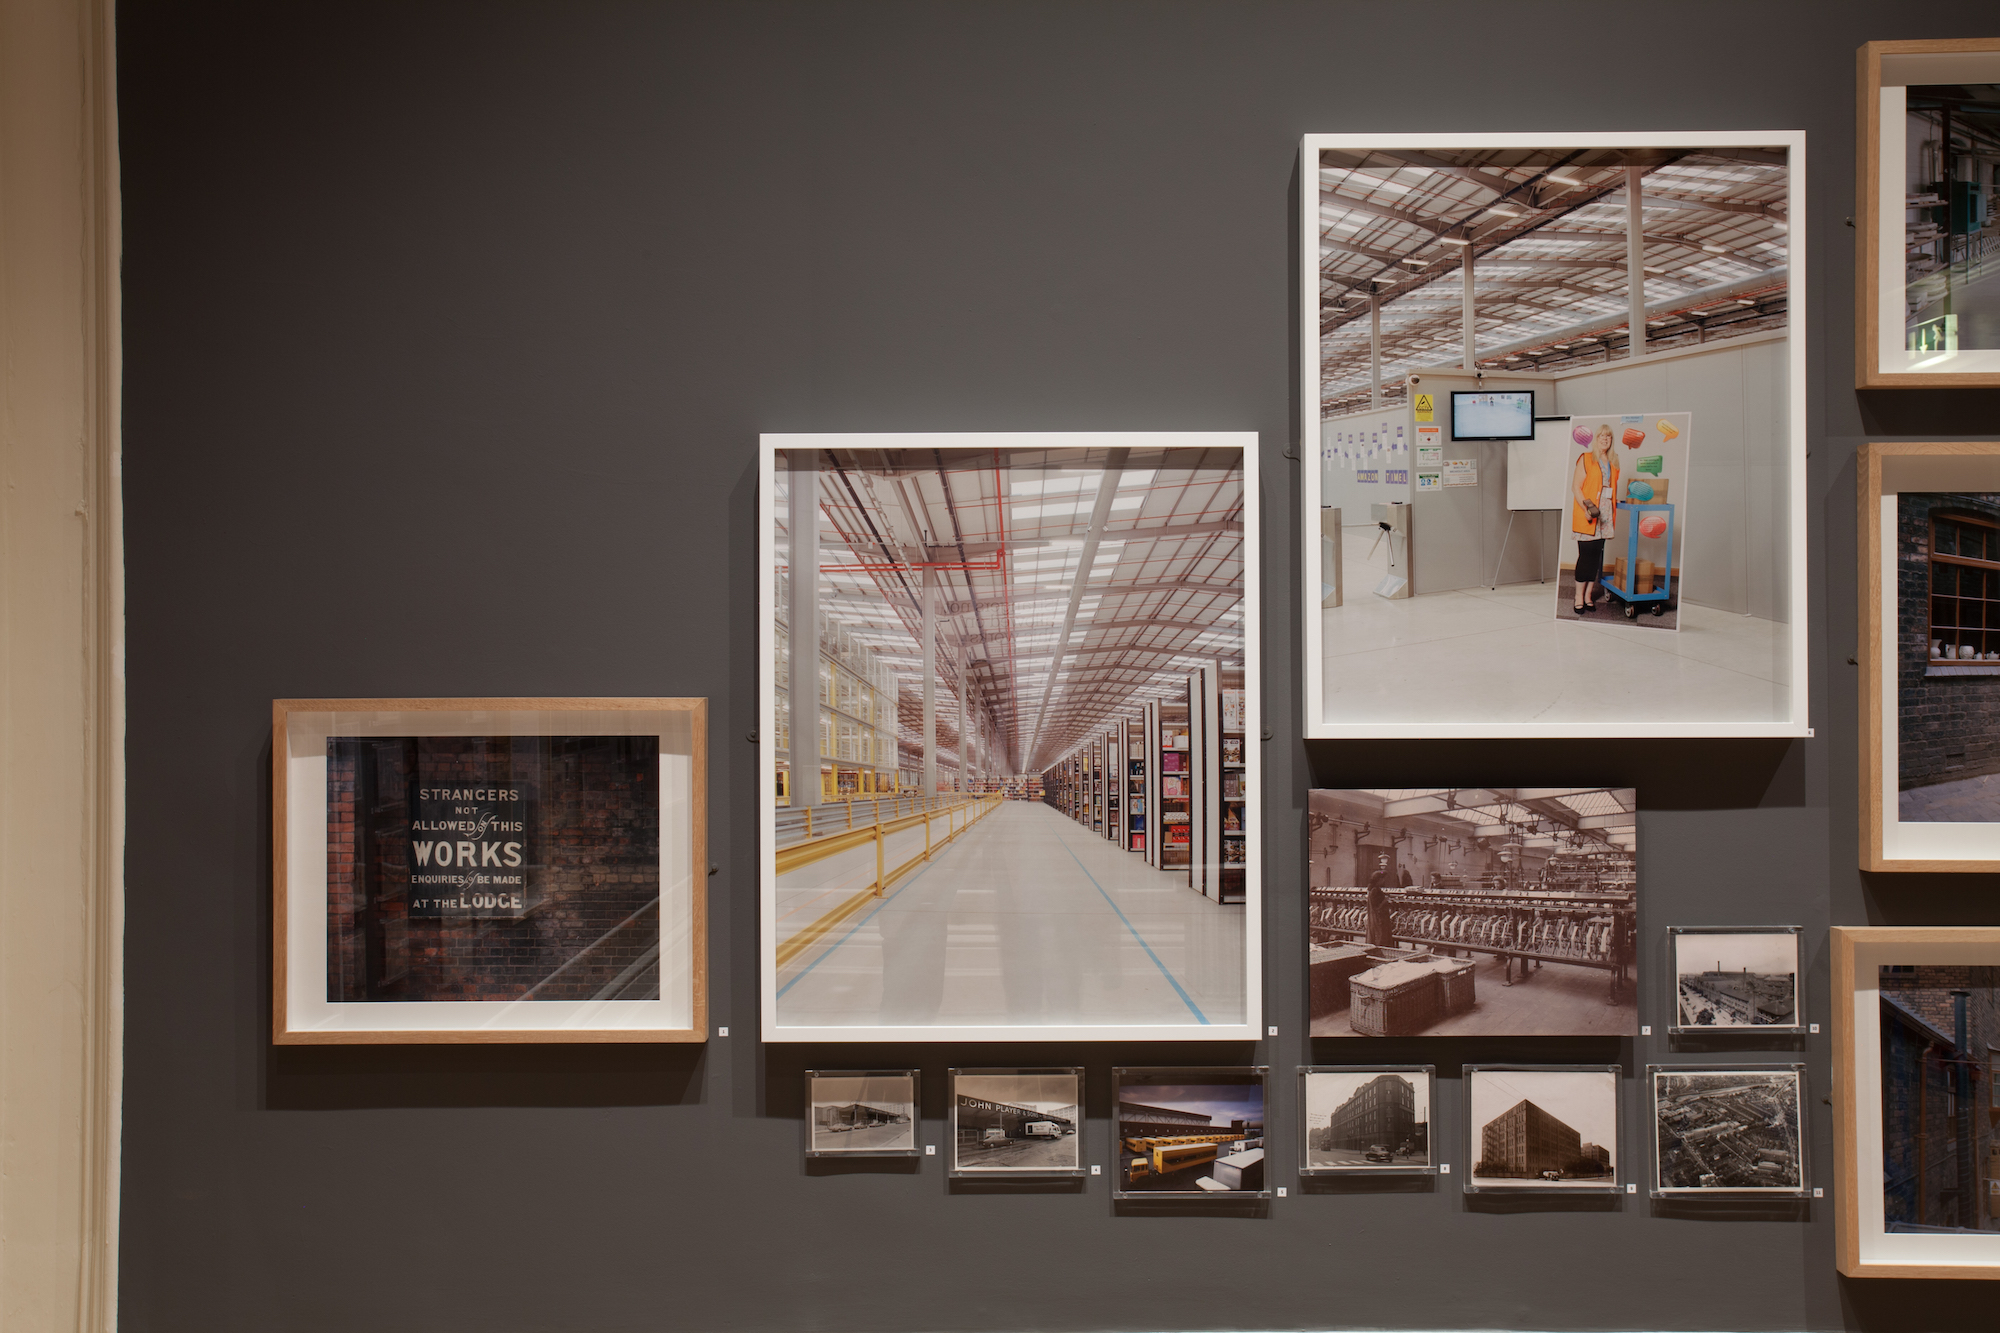 Strangers Not Allowed on This Works - FORMAT International Photography Festival 2017, Nottingham Castle